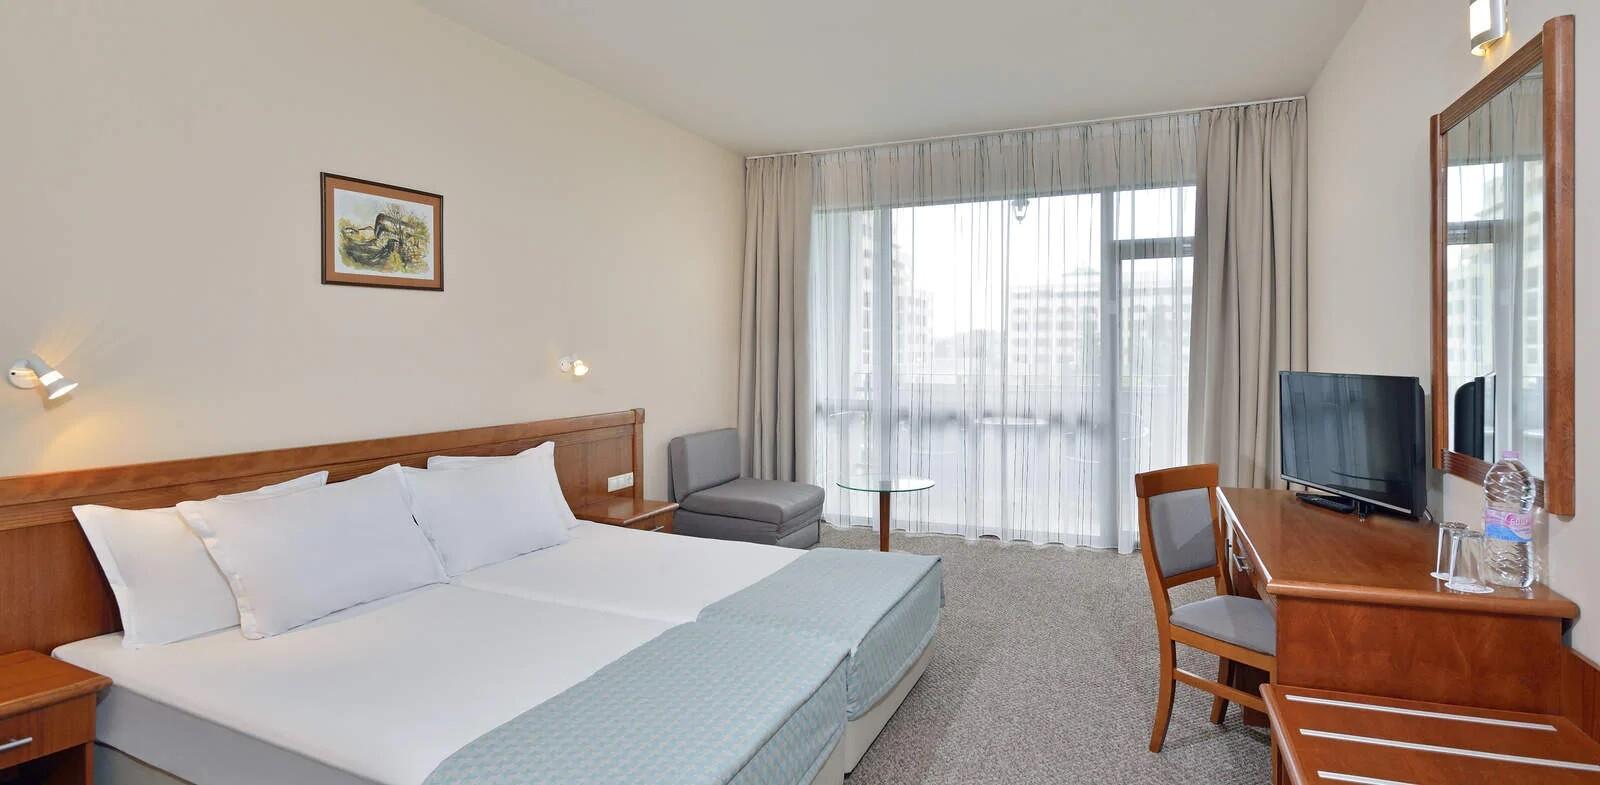 Хотели Сол Несебър Бей и Маре - стая